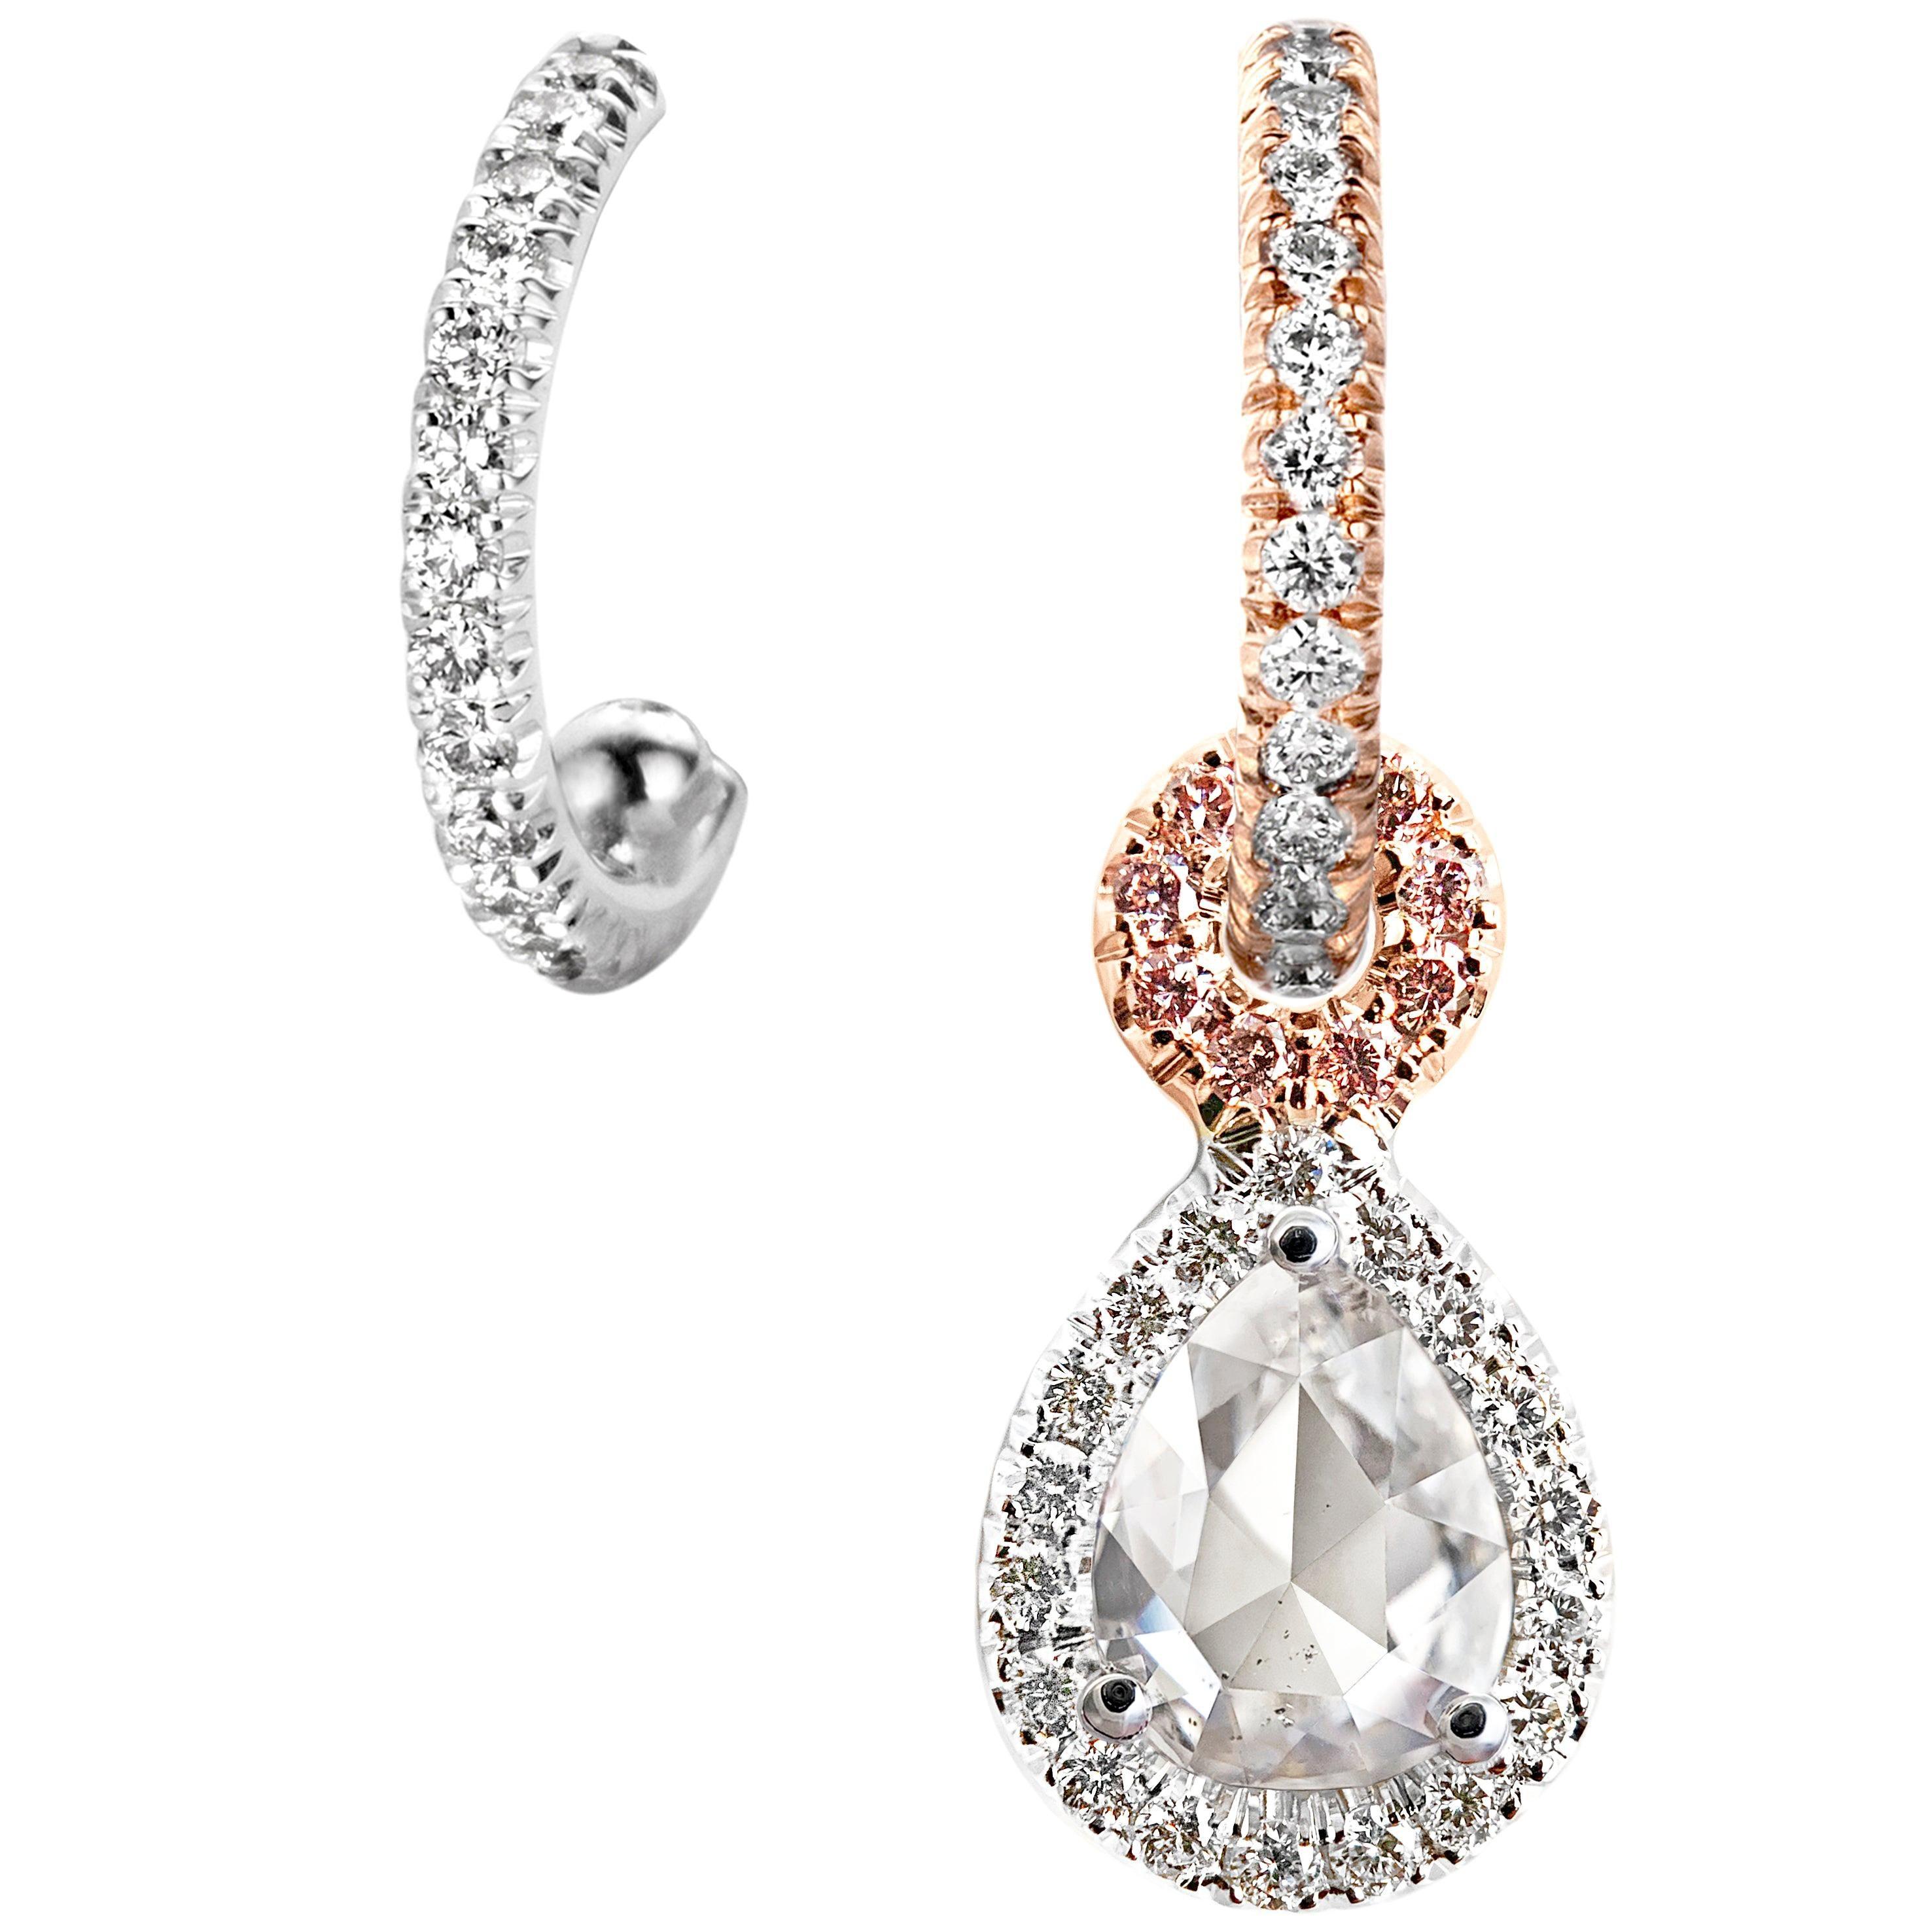 Handmade Mismatched 0.90ct Rose-Cut Diamond Pink White Diamond Charm Earrings